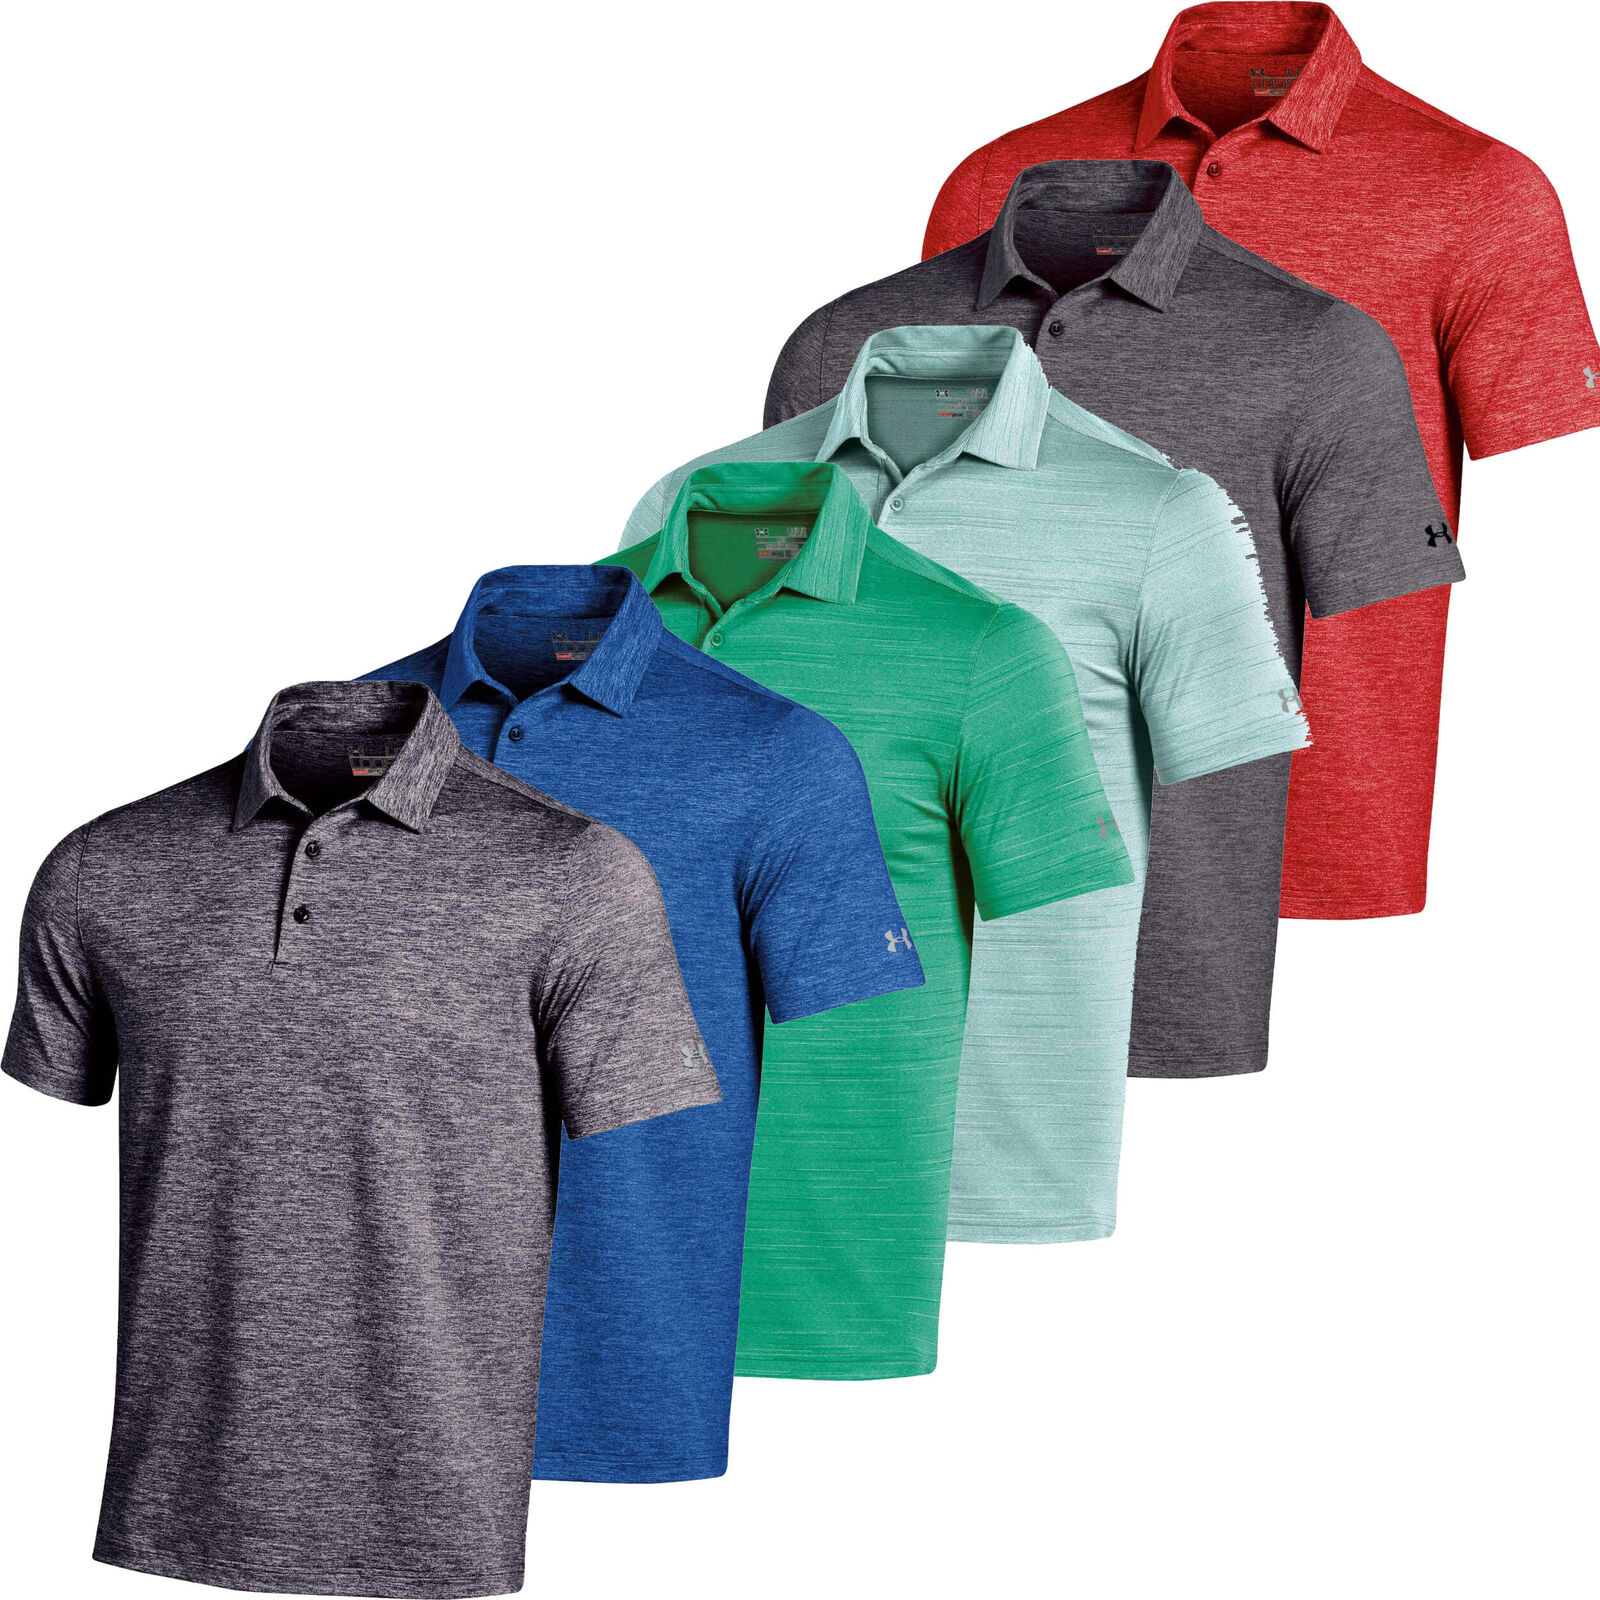 2e0d8b8b Under Armour UA Elevated Heather 2015 Black Golf Shirt XL for sale online |  eBay